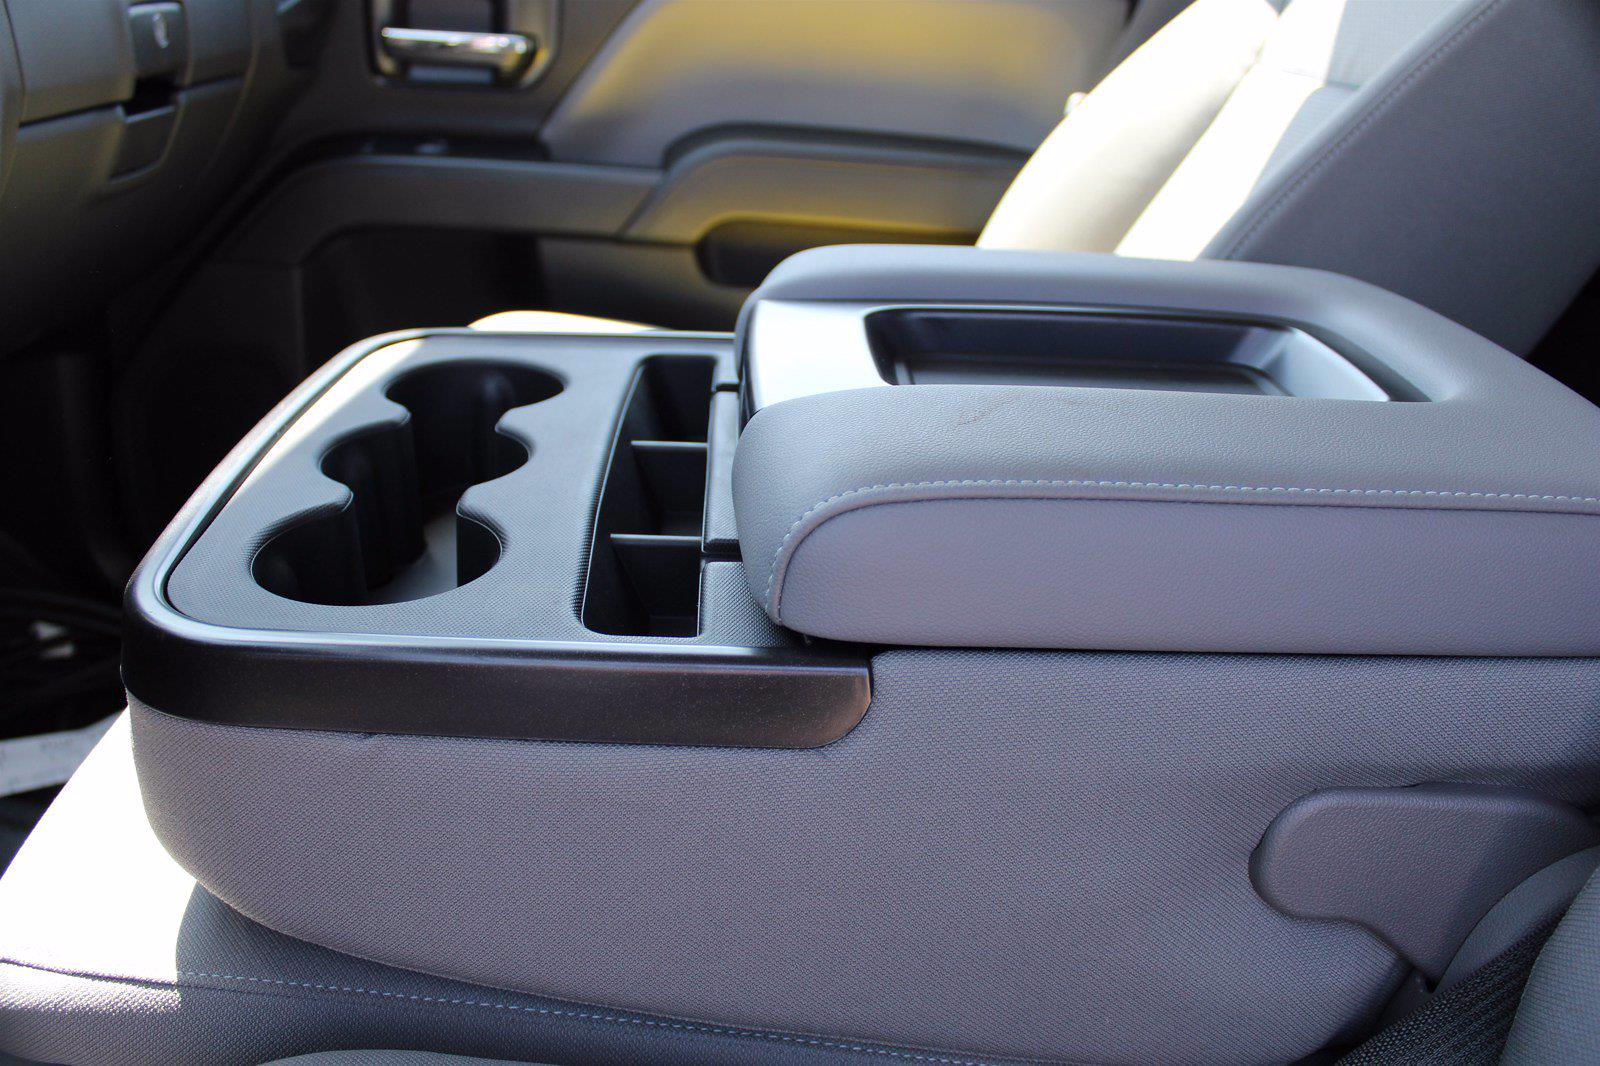 2020 Chevrolet Silverado 5500 DRW 4x2, Cab Chassis #D100457 - photo 6